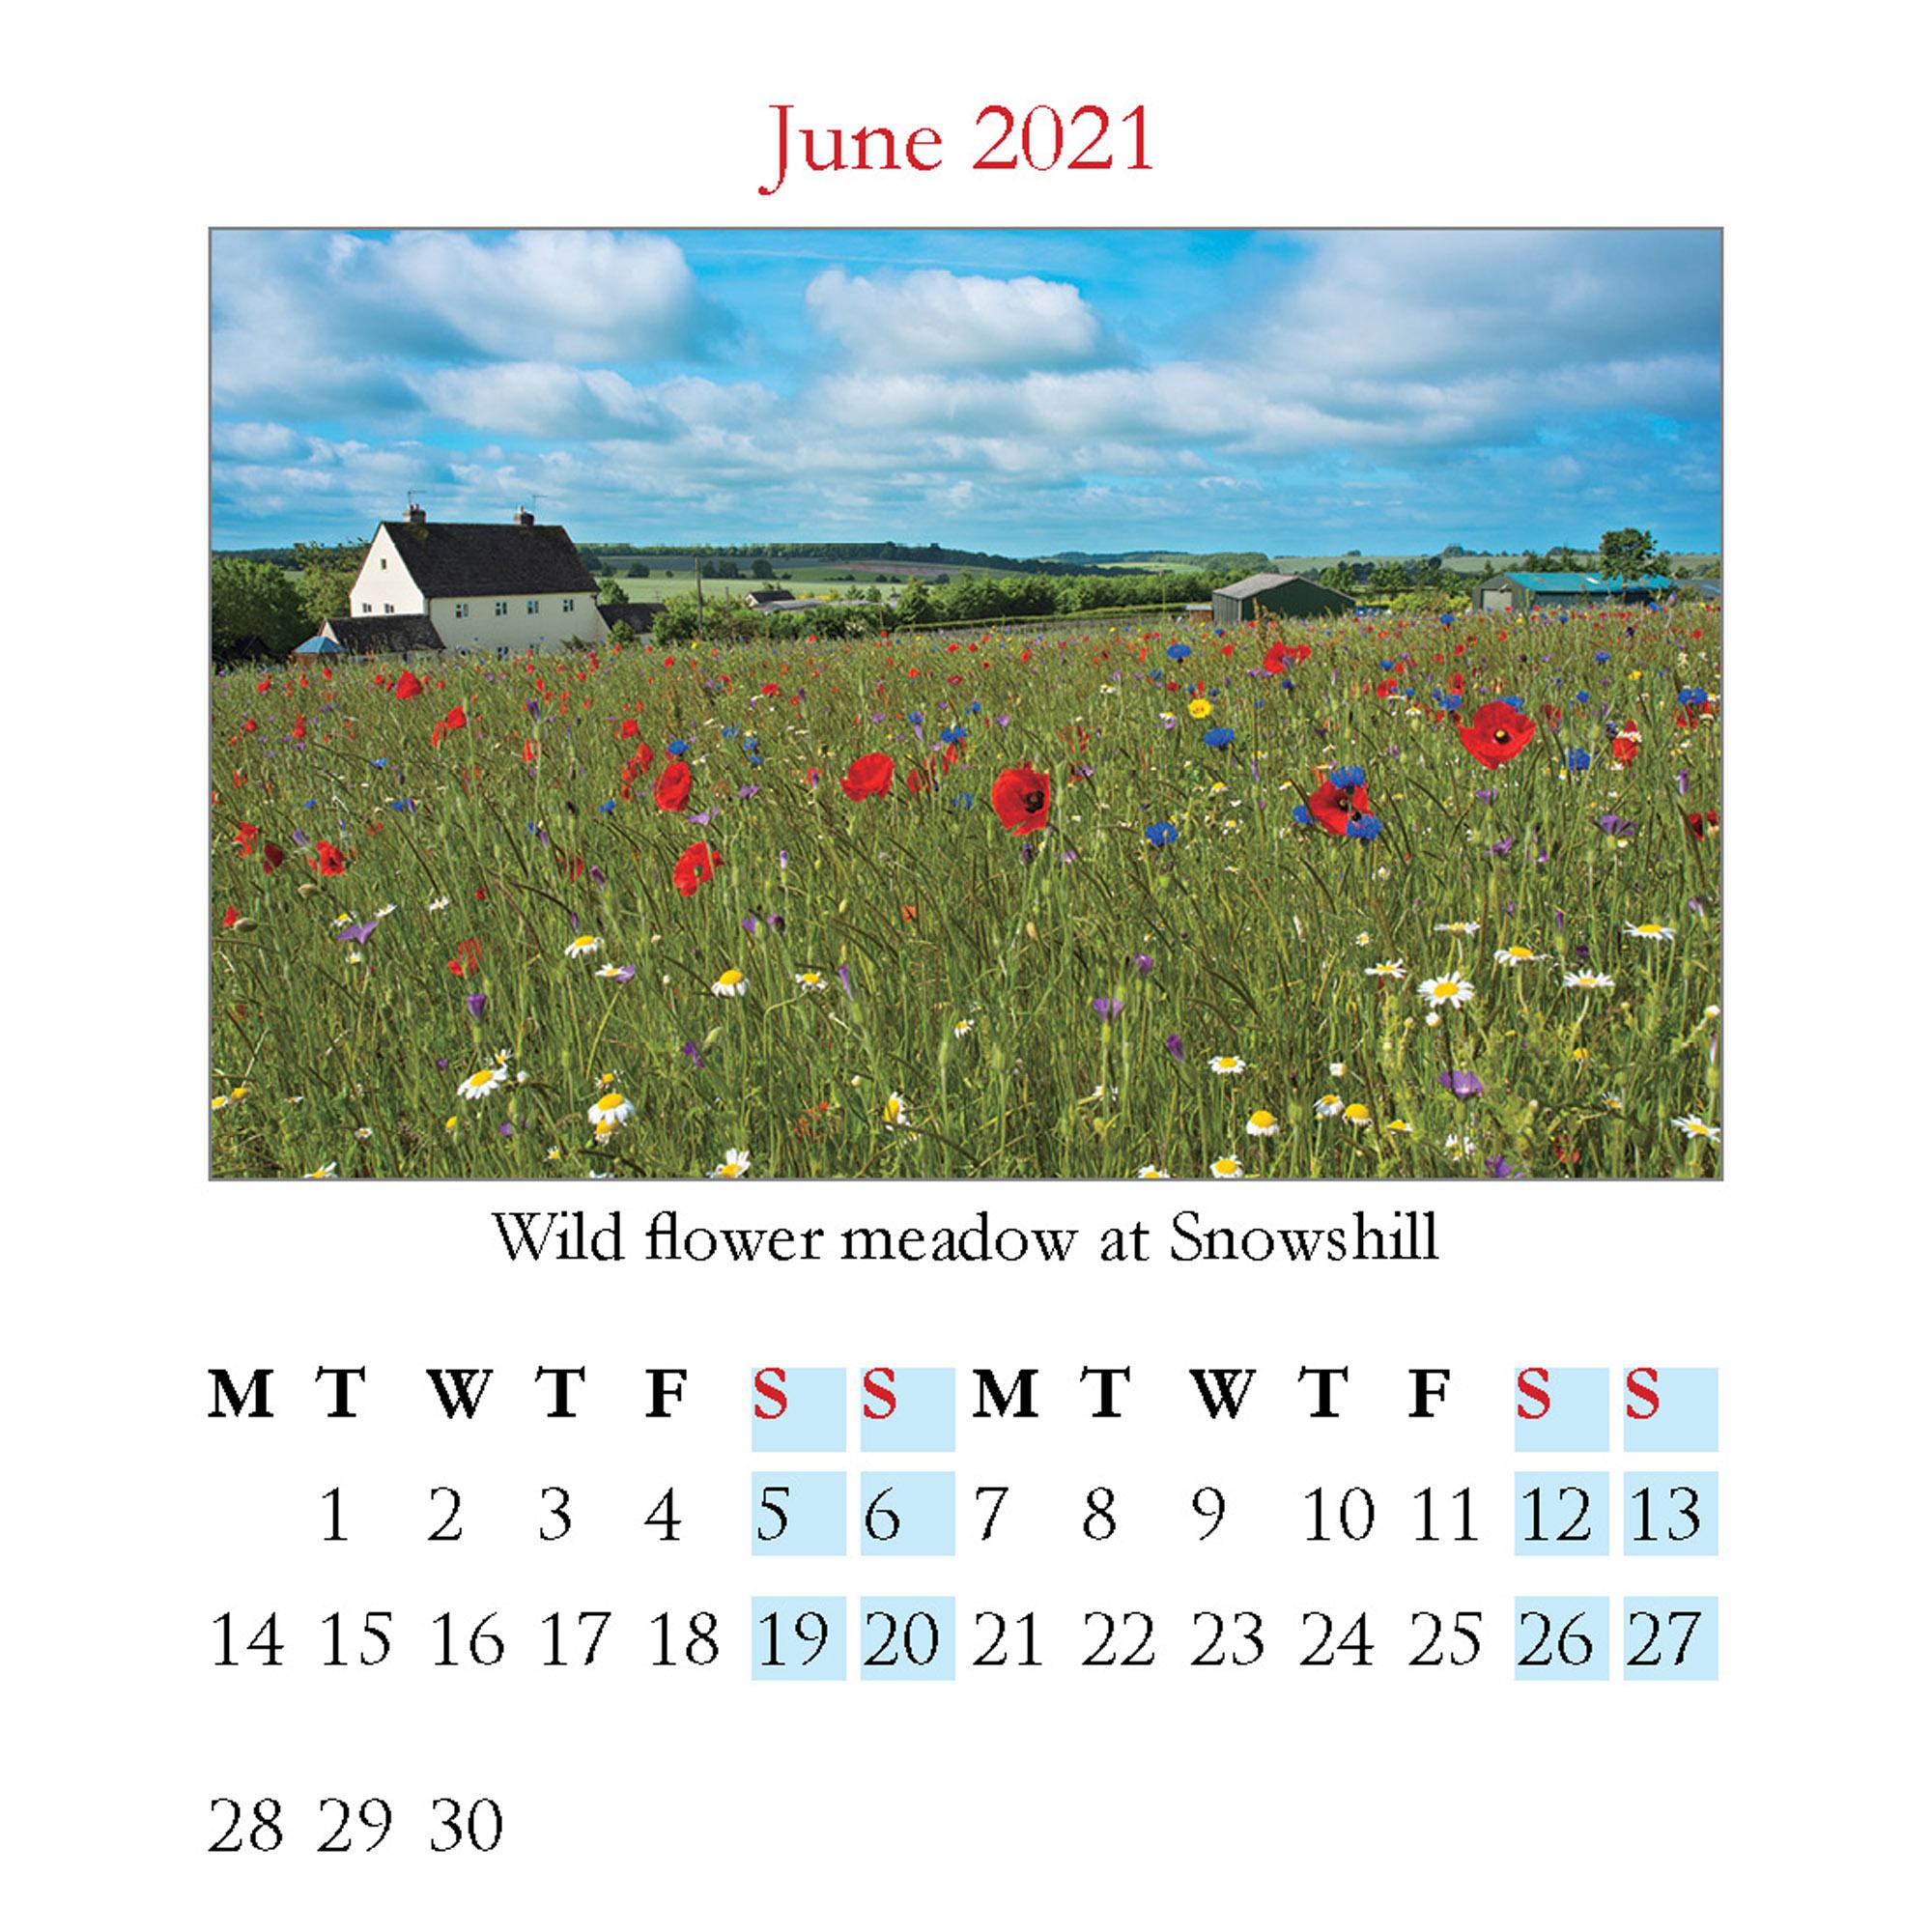 2021 Cotswolds mini desktop calendar - inside layout